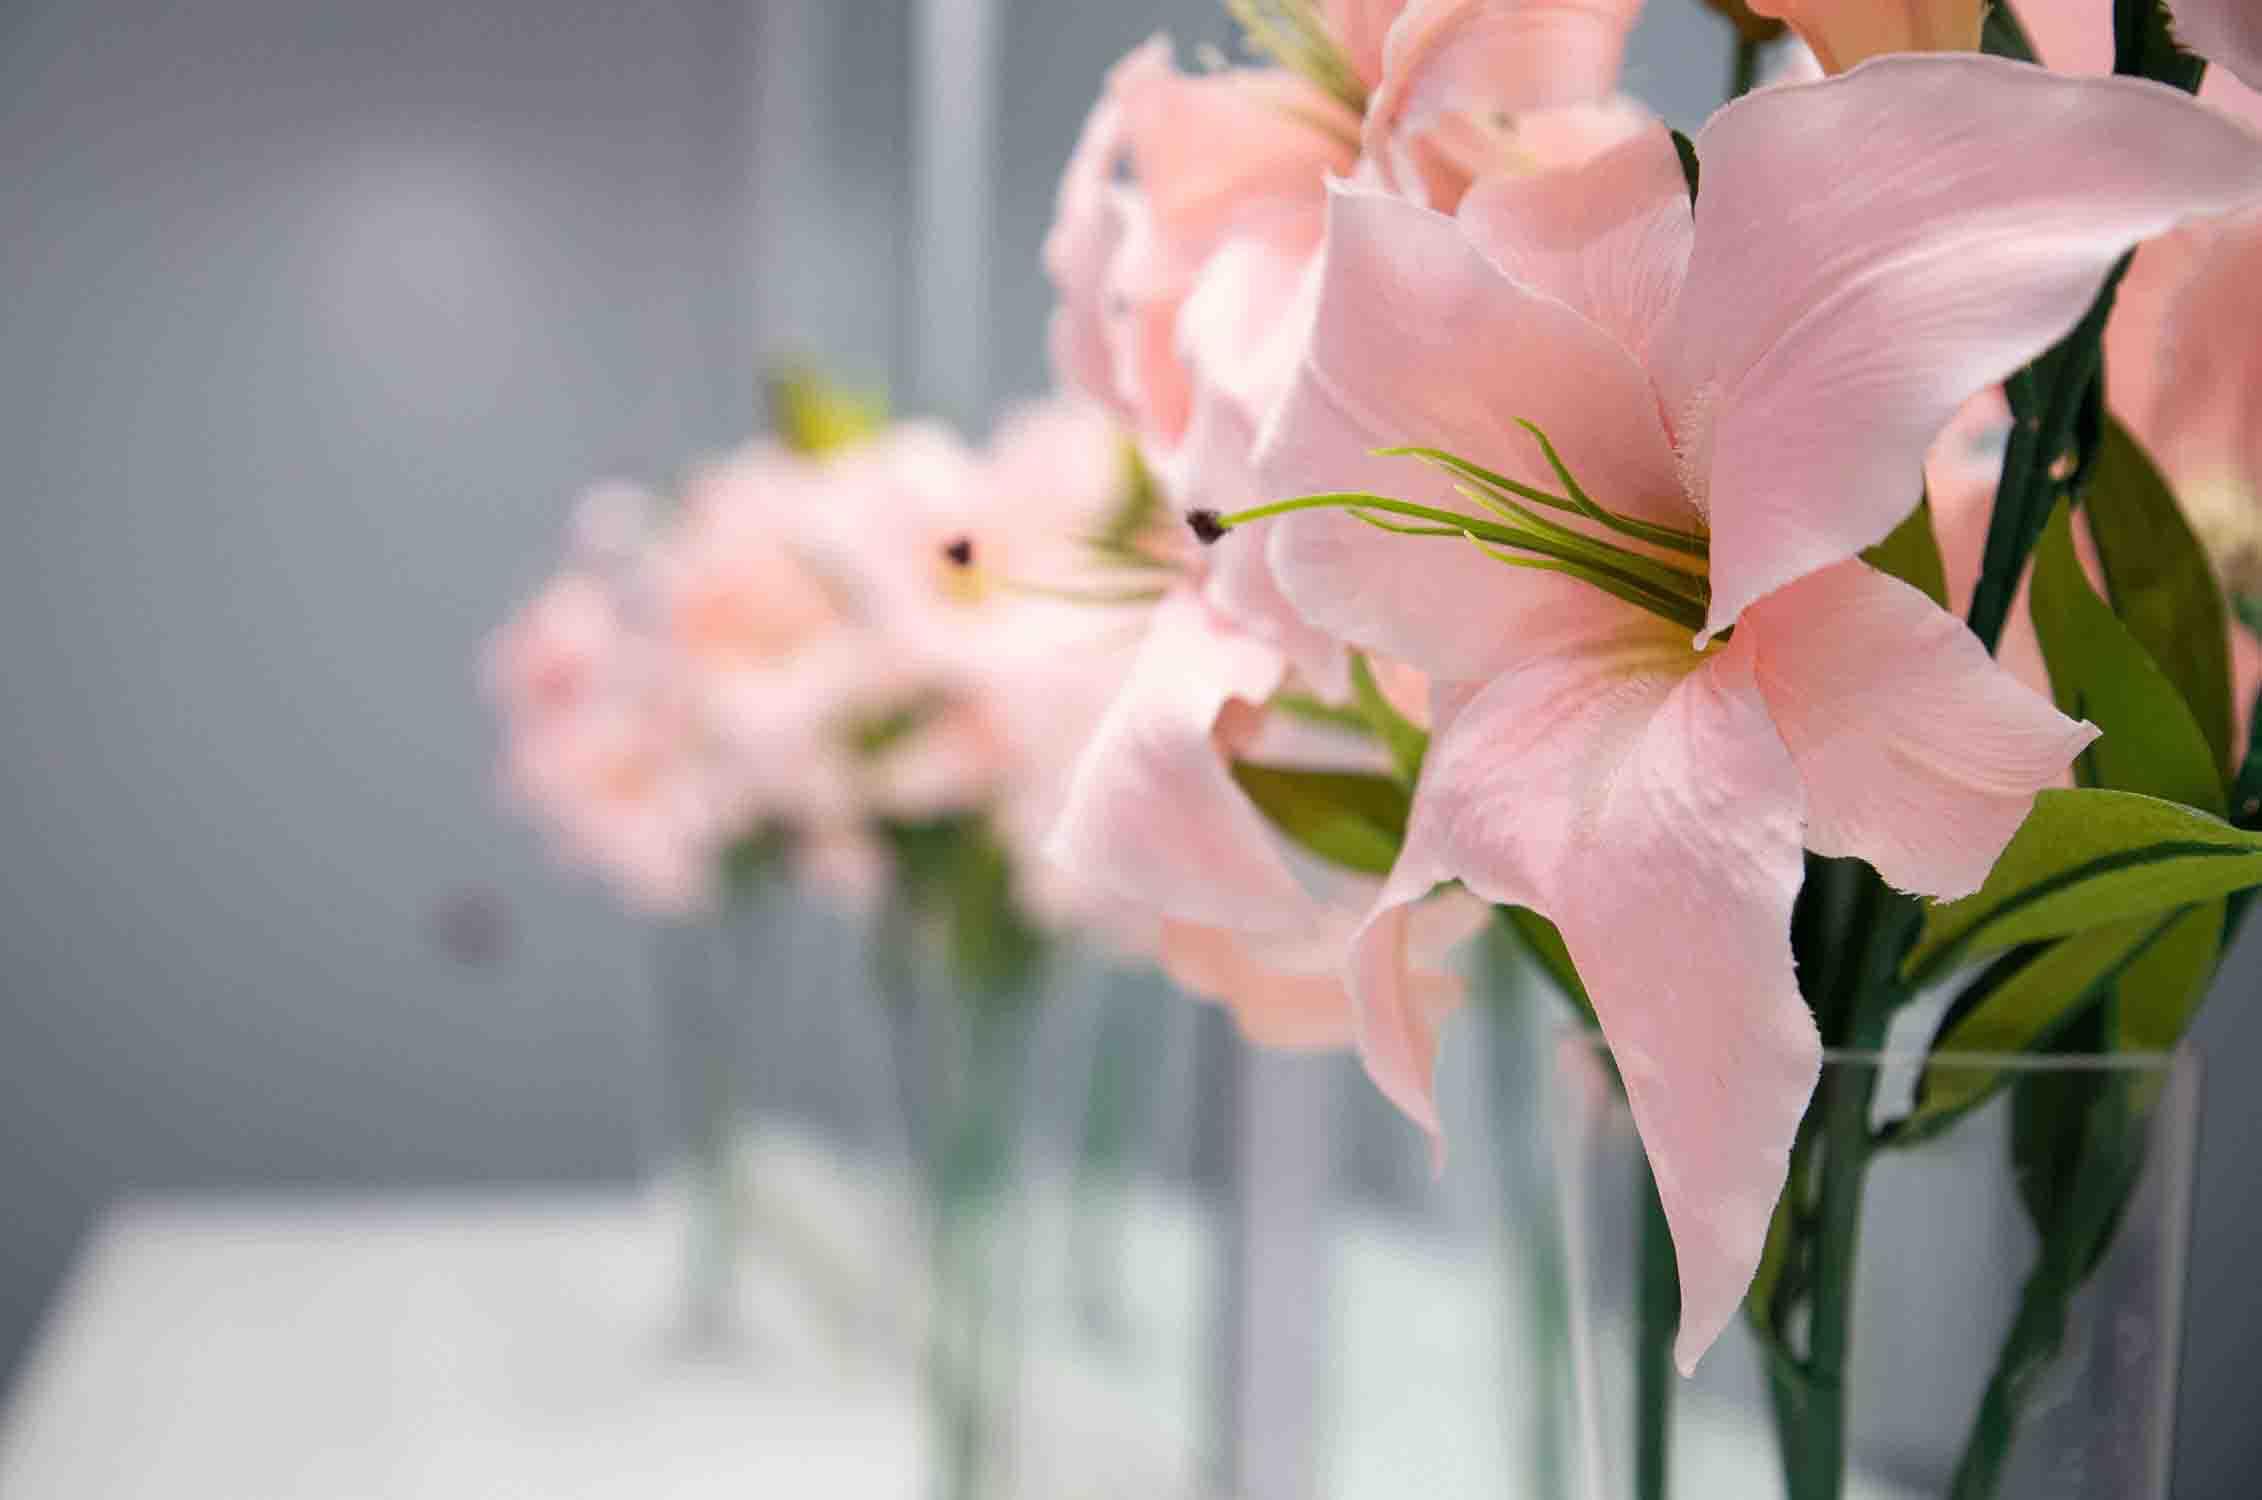 pink florals in vase